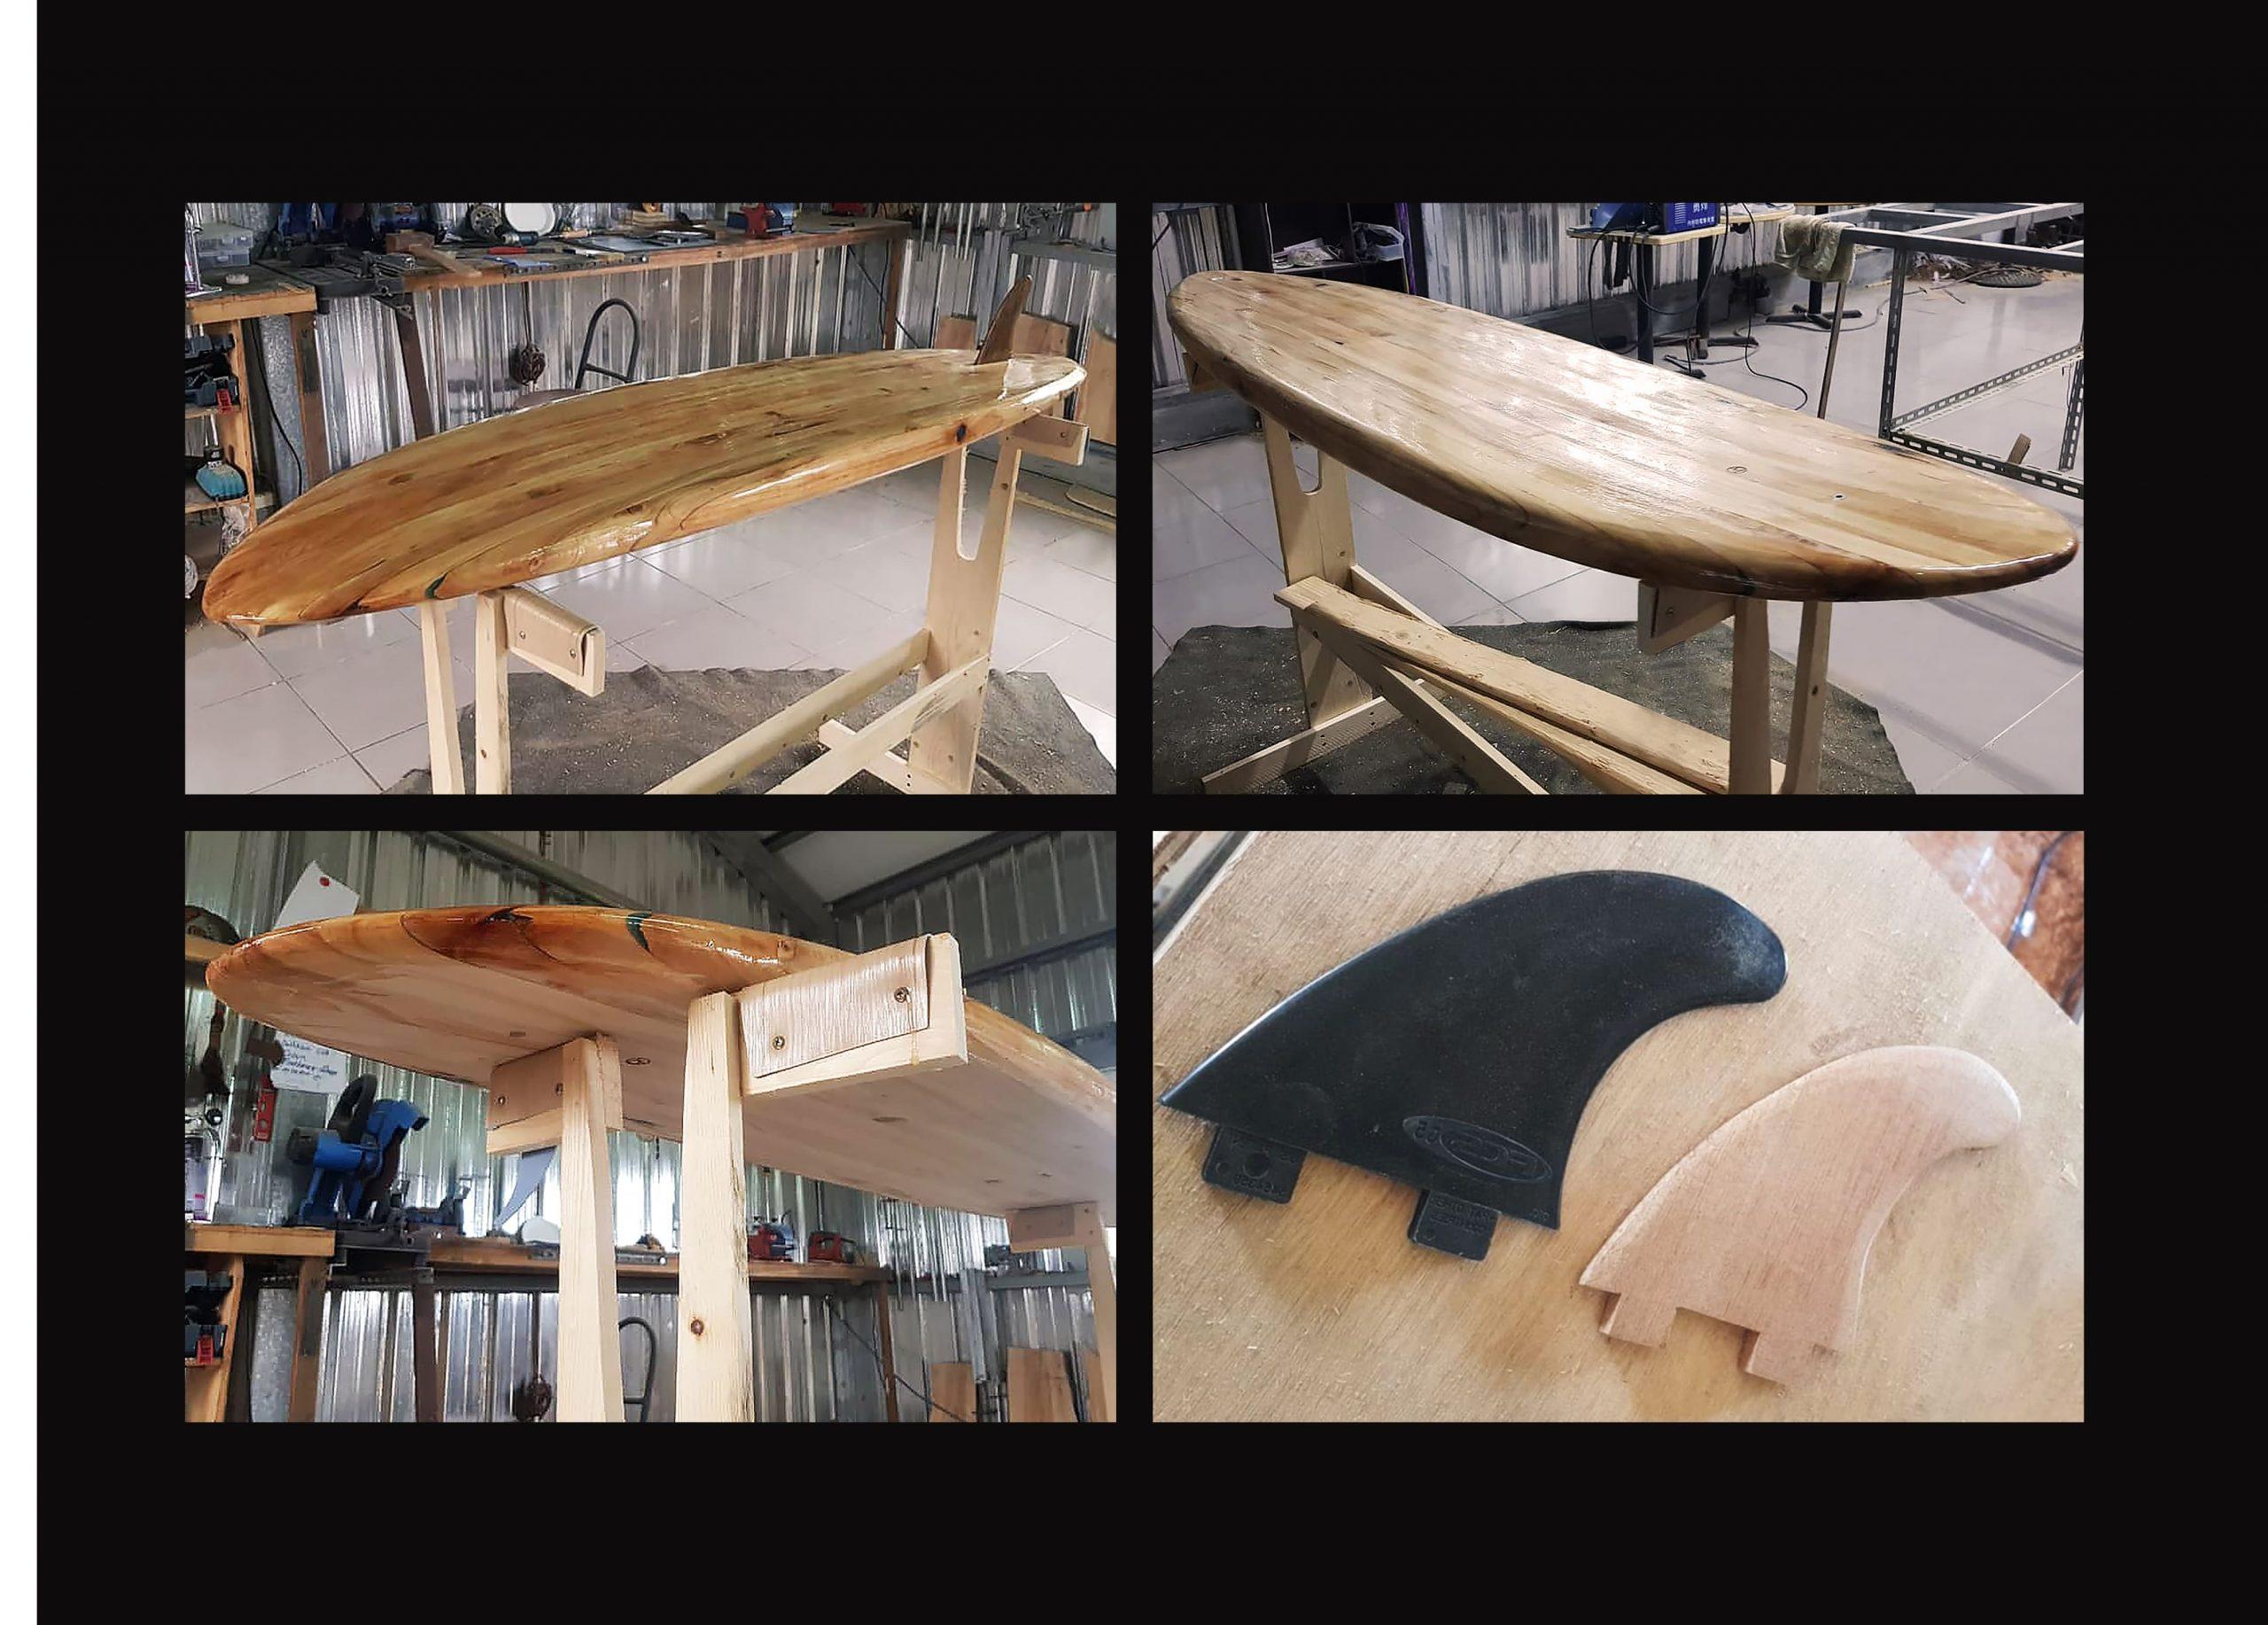 FabsFurniture Taiwan Portfolio - 2021 - wooden surfboard and fins